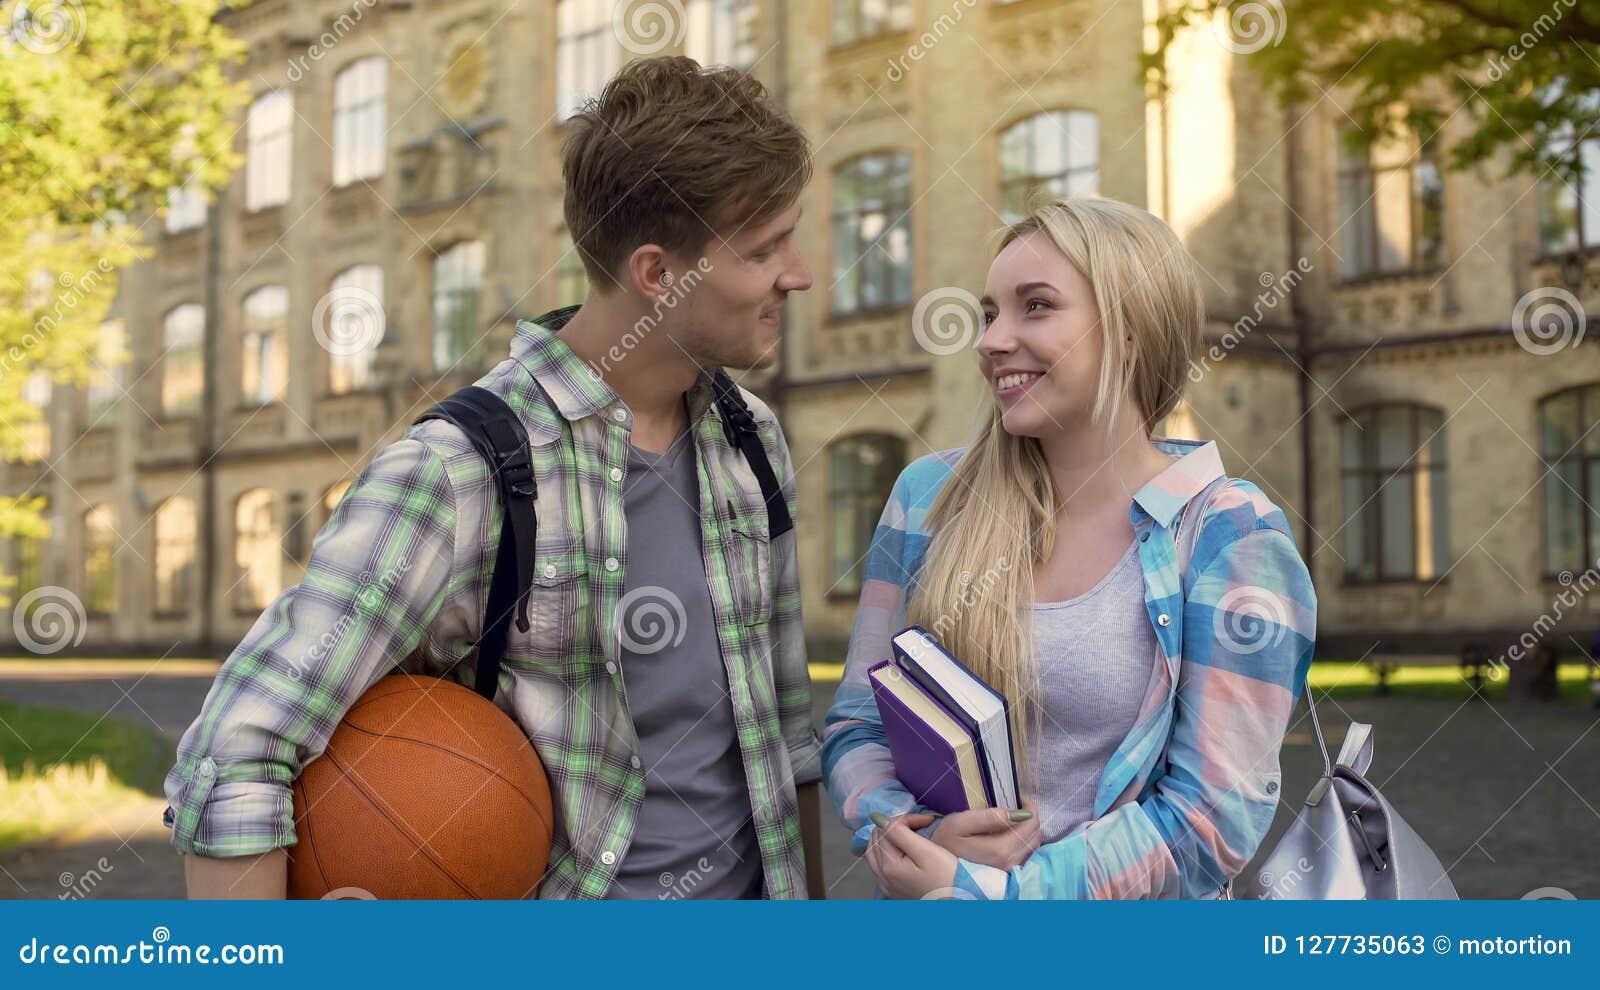 guy flirting with girl